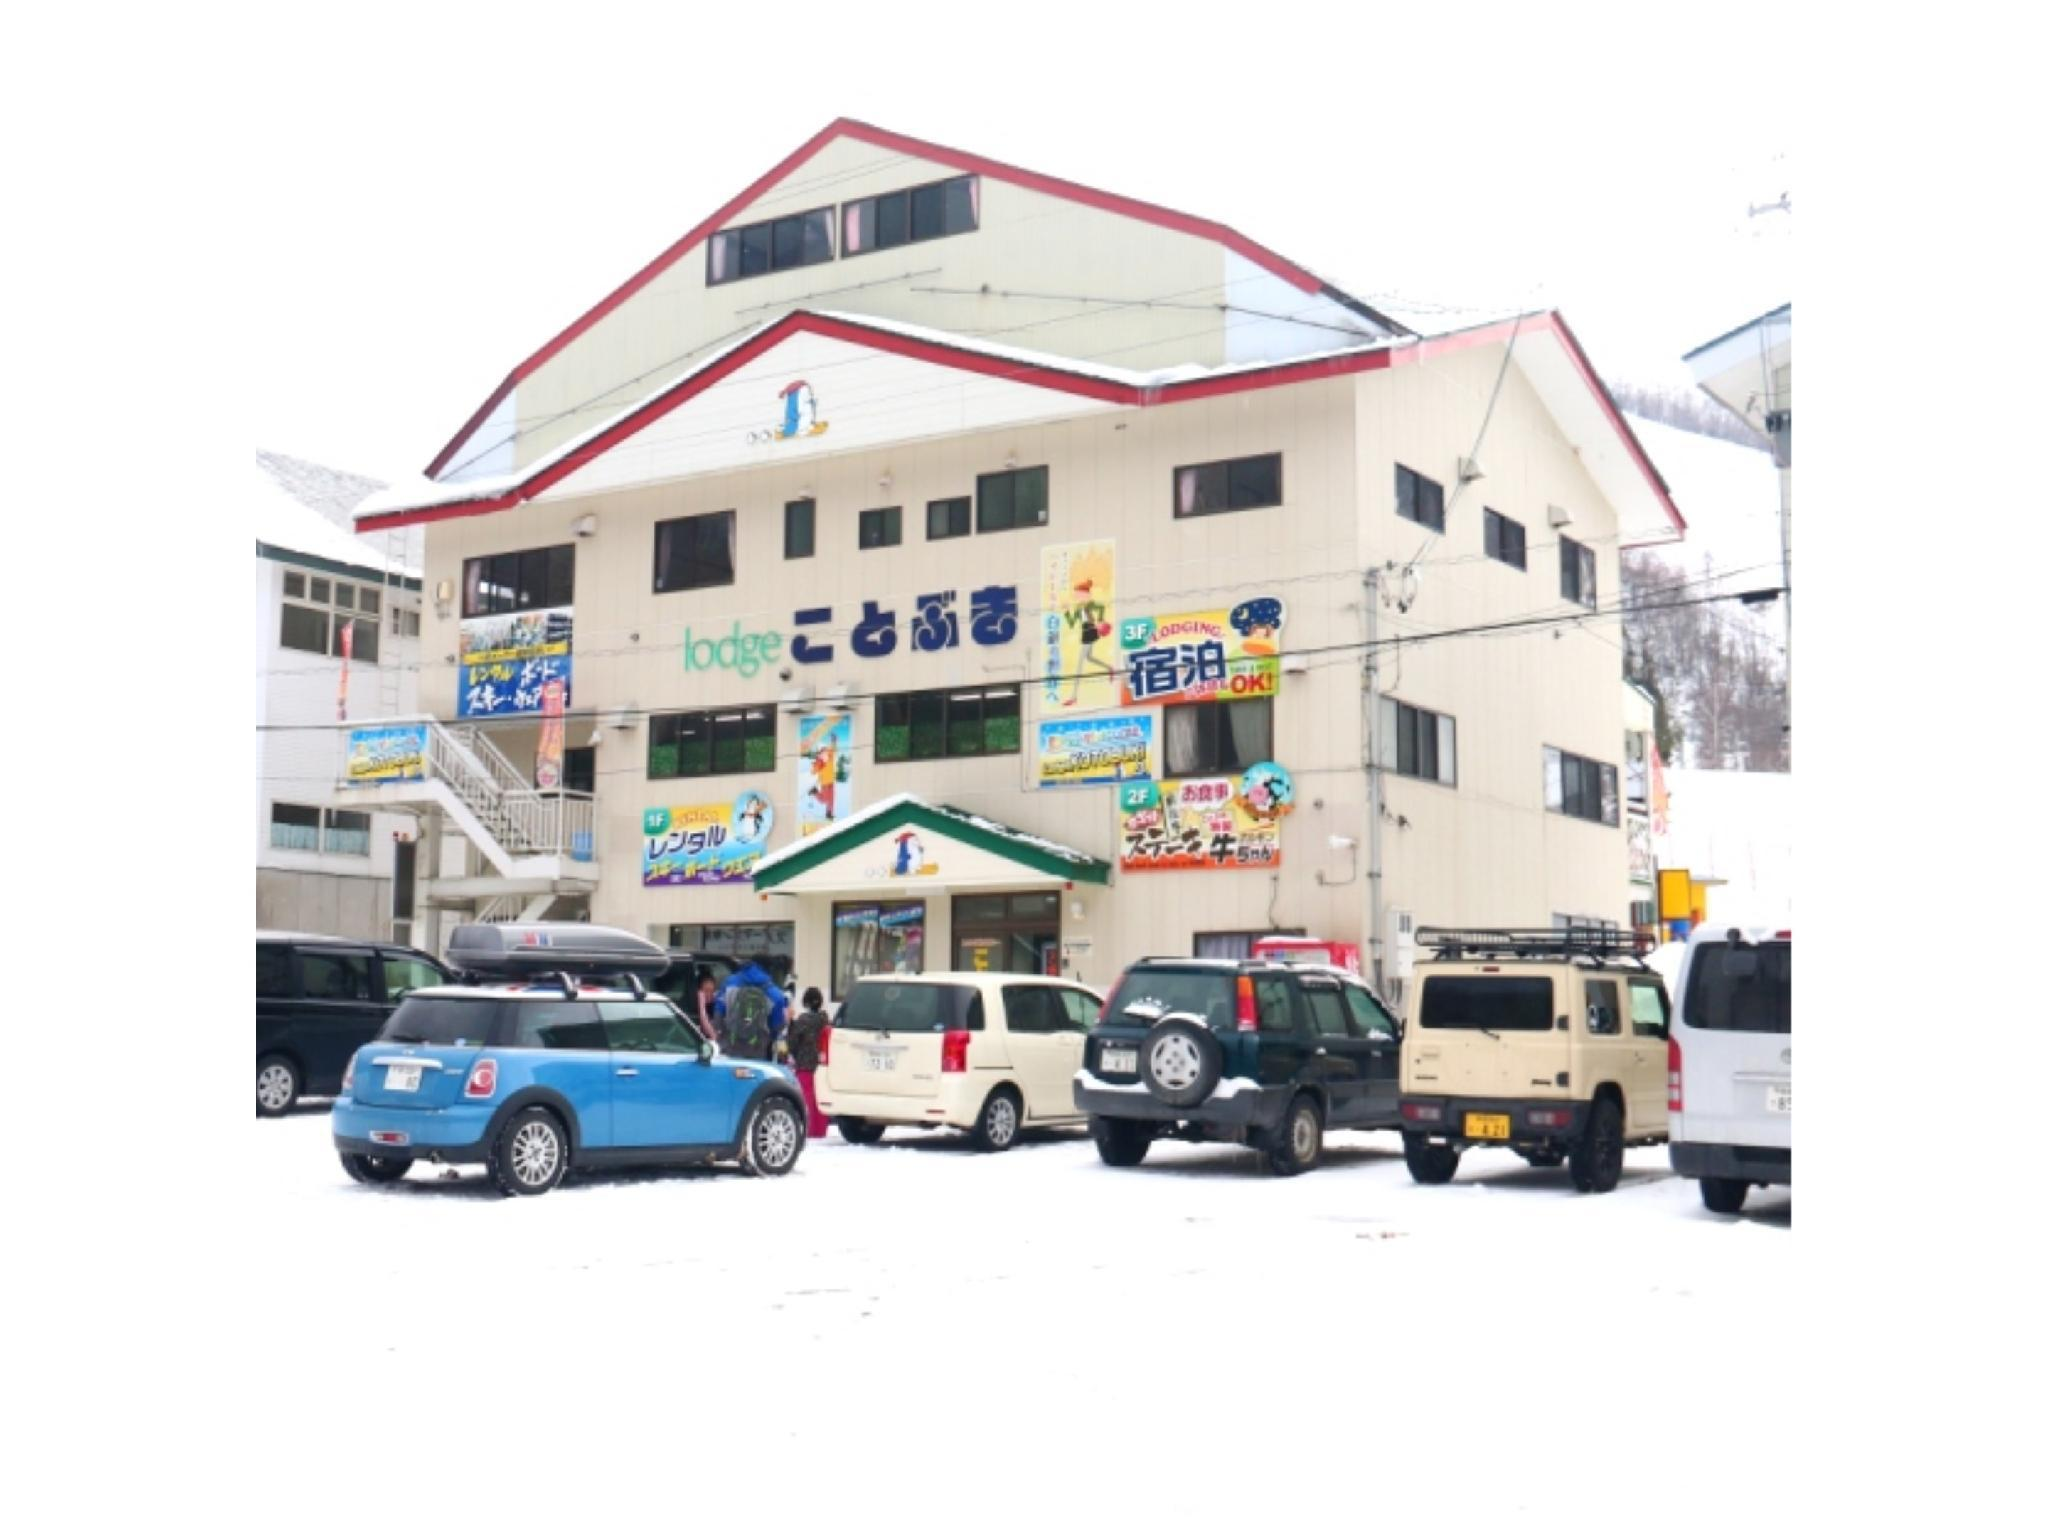 Lodge Kotobuki